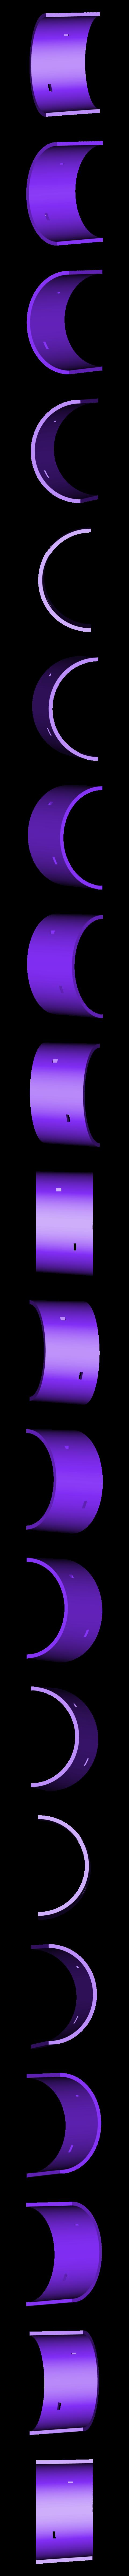 Boiler_Section_1_-_SCALED_Part_4b-.STL Download free STL file 4-8-8-4 Big Boy Locomotive • 3D printer object, RaymondDeLuca